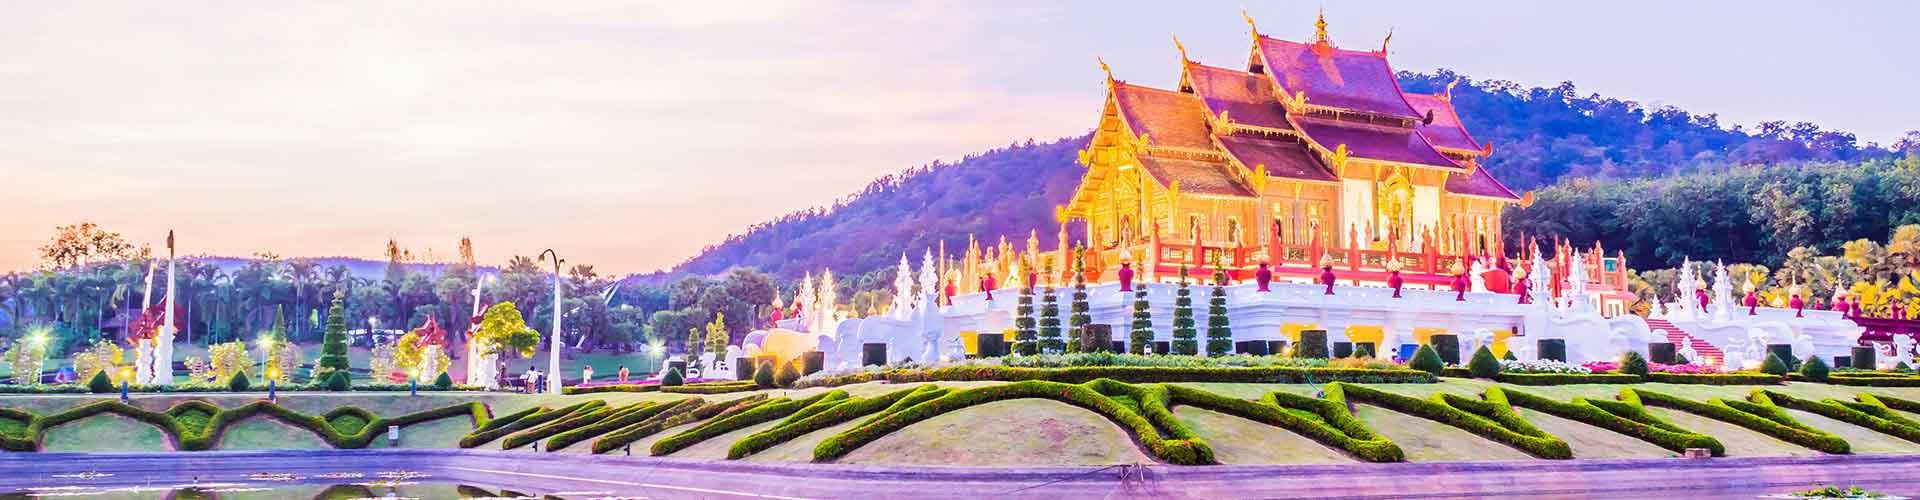 Chiang Mai - Albergues en Chiang Mai. Mapas de Chiang Mai, Fotos y Comentarios para cada Albergue en Chiang Mai.